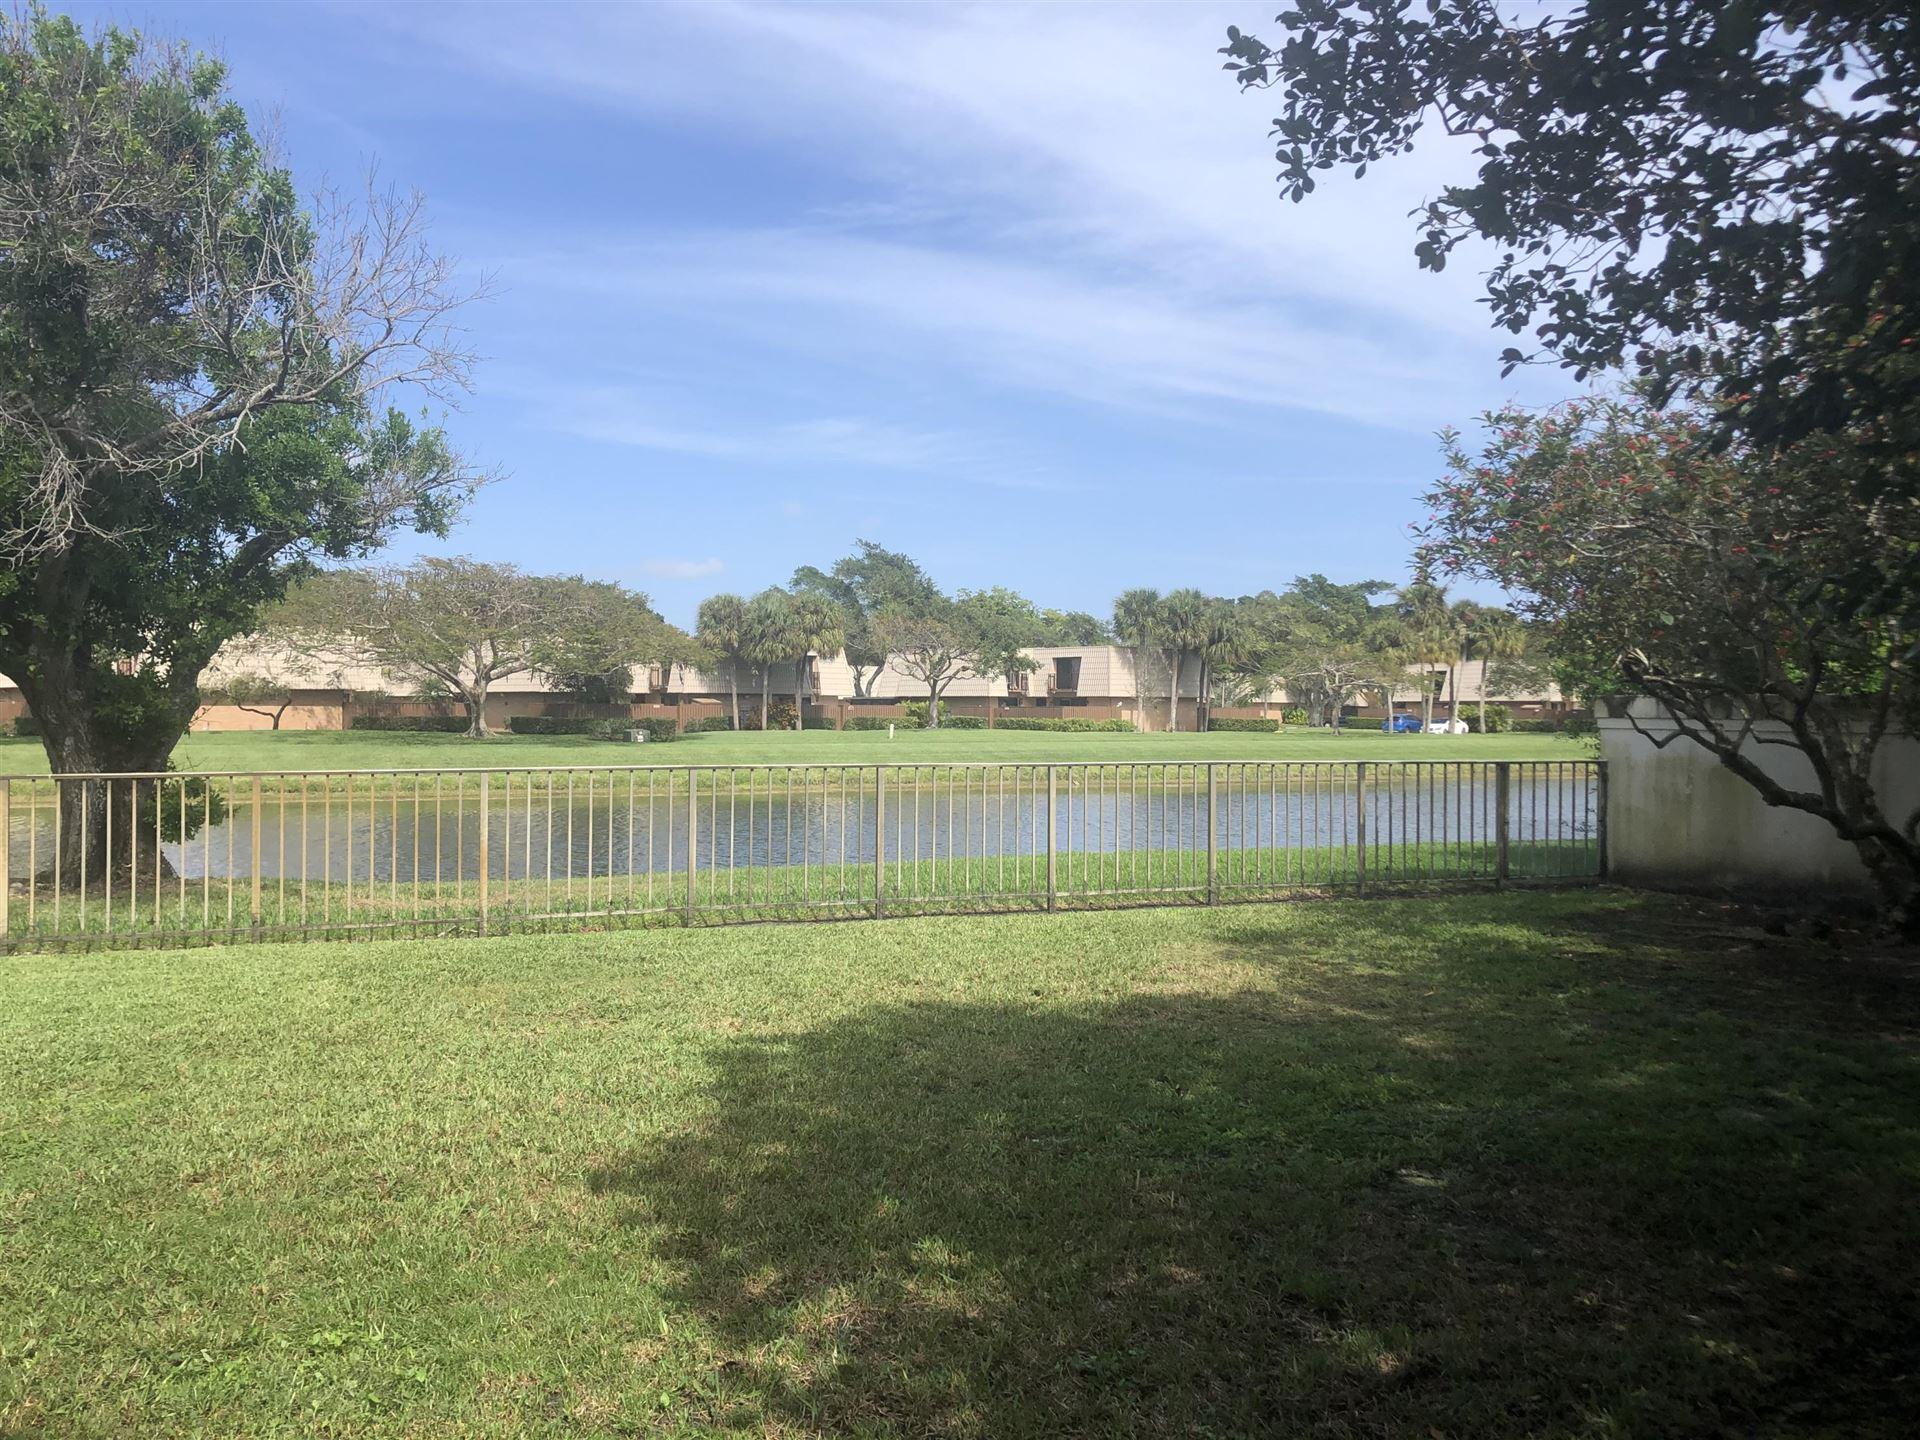 Photo of 2637 Mohawk Circle, West Palm Beach, FL 33409 (MLS # RX-10697009)